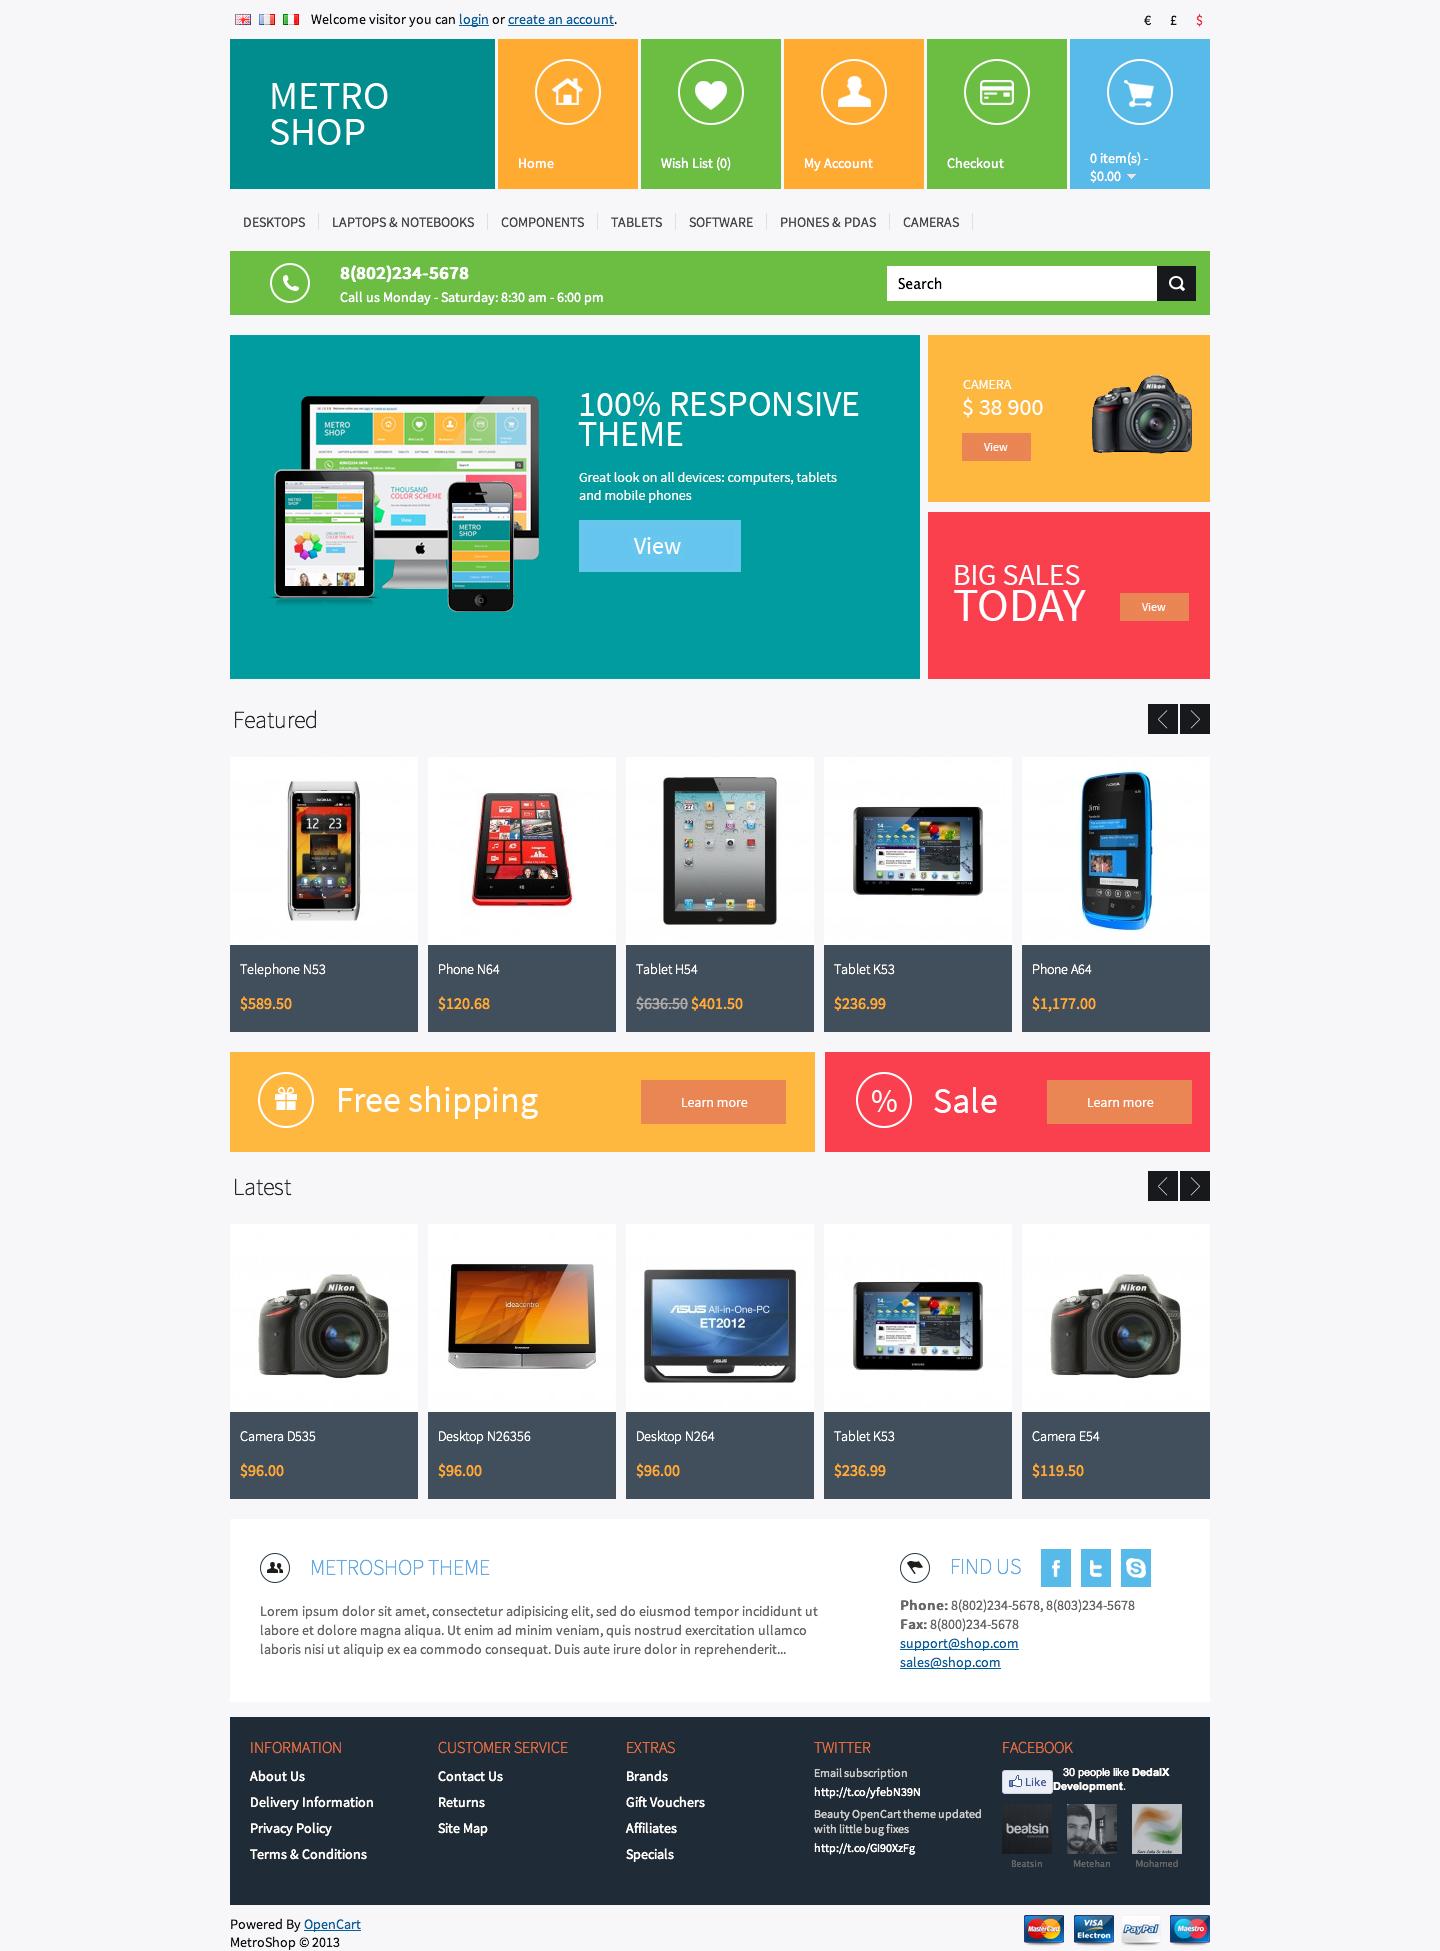 MetroShop - Premium OpenCart theme by dedalx | ThemeForest